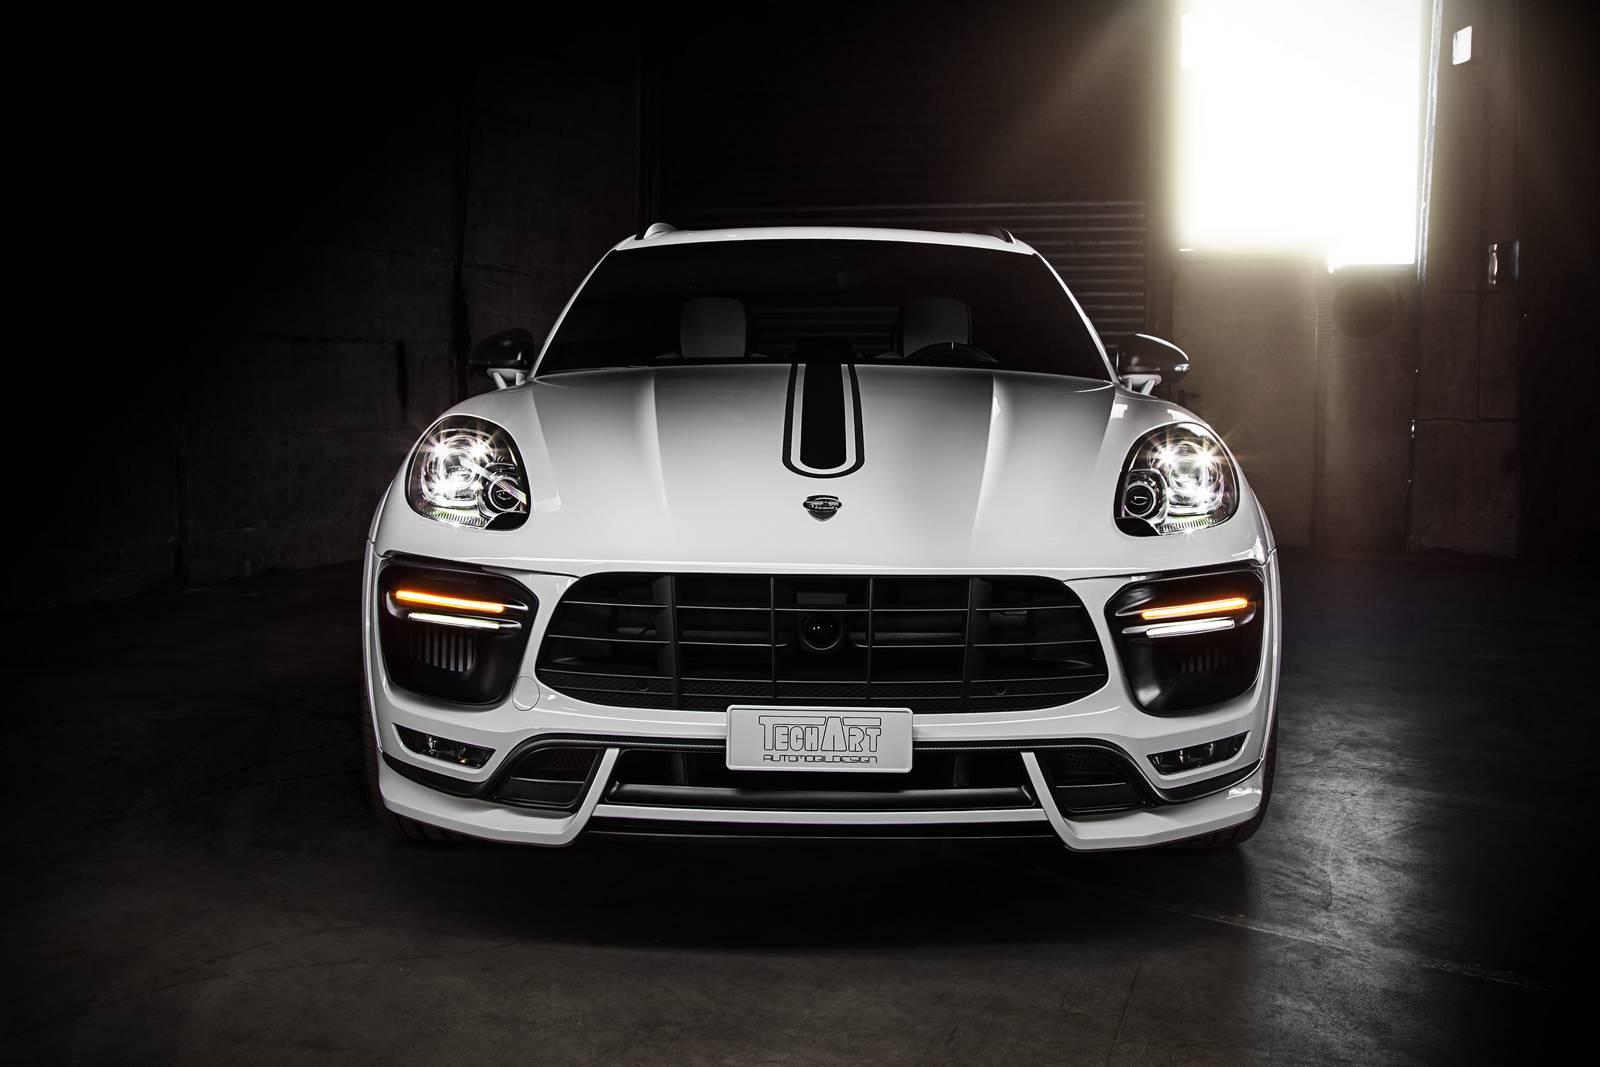 Новая подвеска от TechArt для Porsche Macan и Cayenne